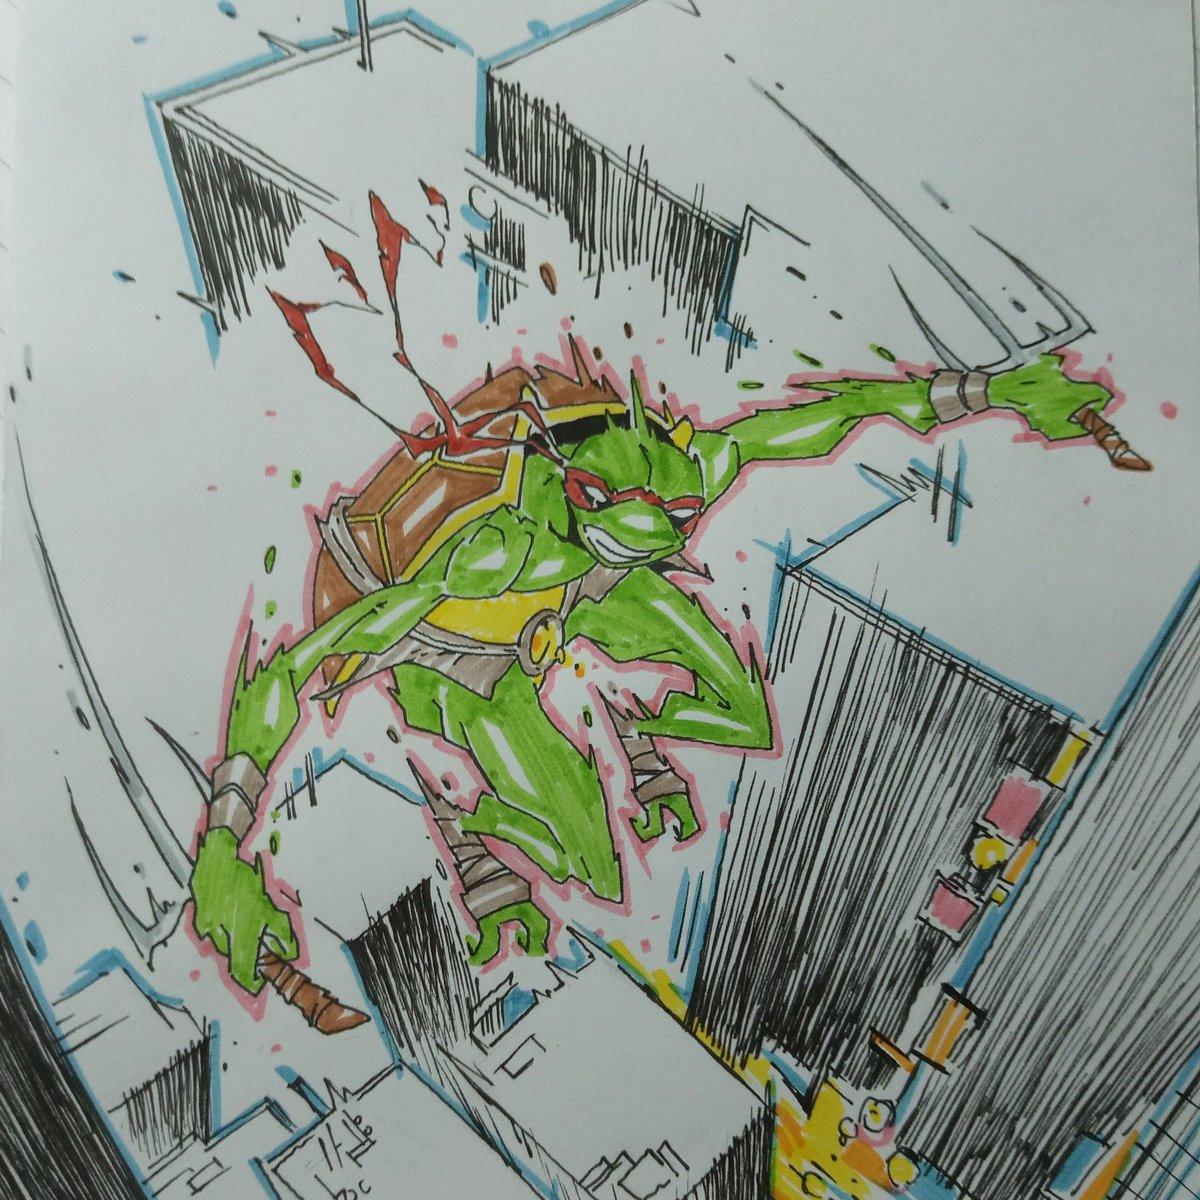 Turtles everywhere!  #TMNT #teenagemutantNinjaturtles #turtle #NinjaTurtles #Ninja #cartoon #animation #raphael #comics #comic #fanart #sketch #Sketching #drawing #artwork #illustration #illustrationart #ArtistOnTwitter #artist @boomstudios @TMNT